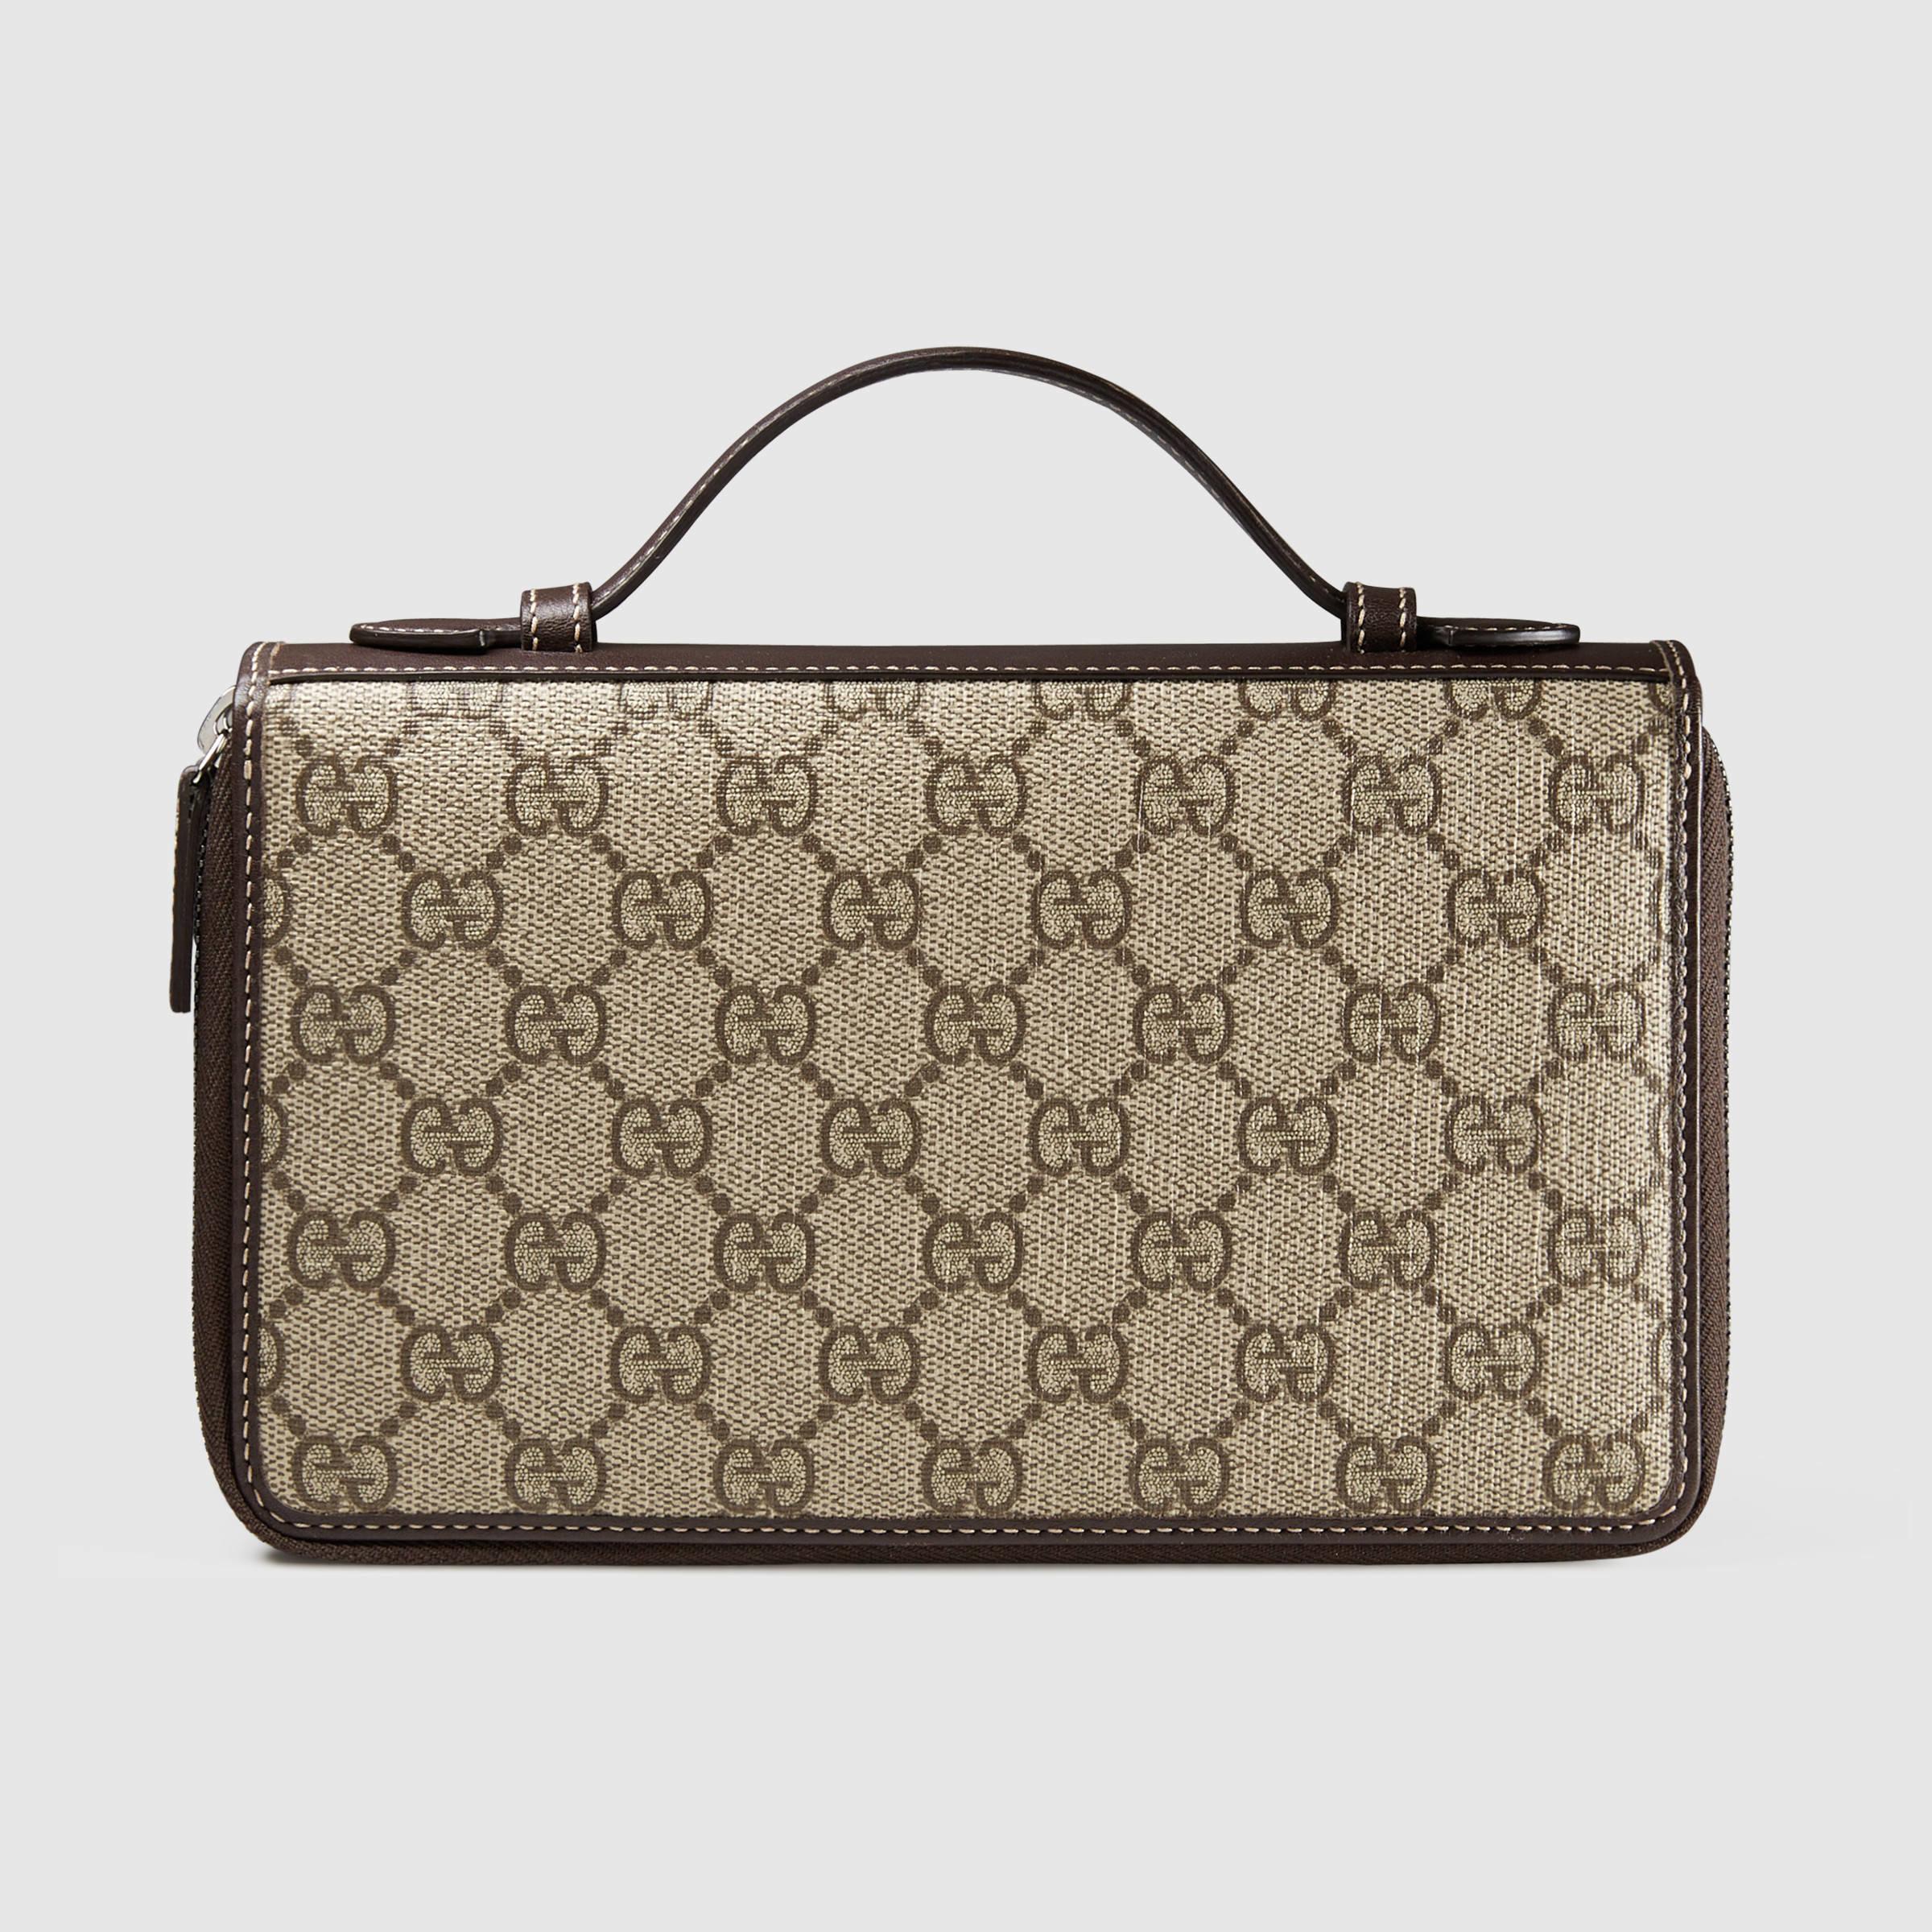 08d7cf2ec8e0 Gucci Gg Supreme Travel Document Case in Brown - Lyst